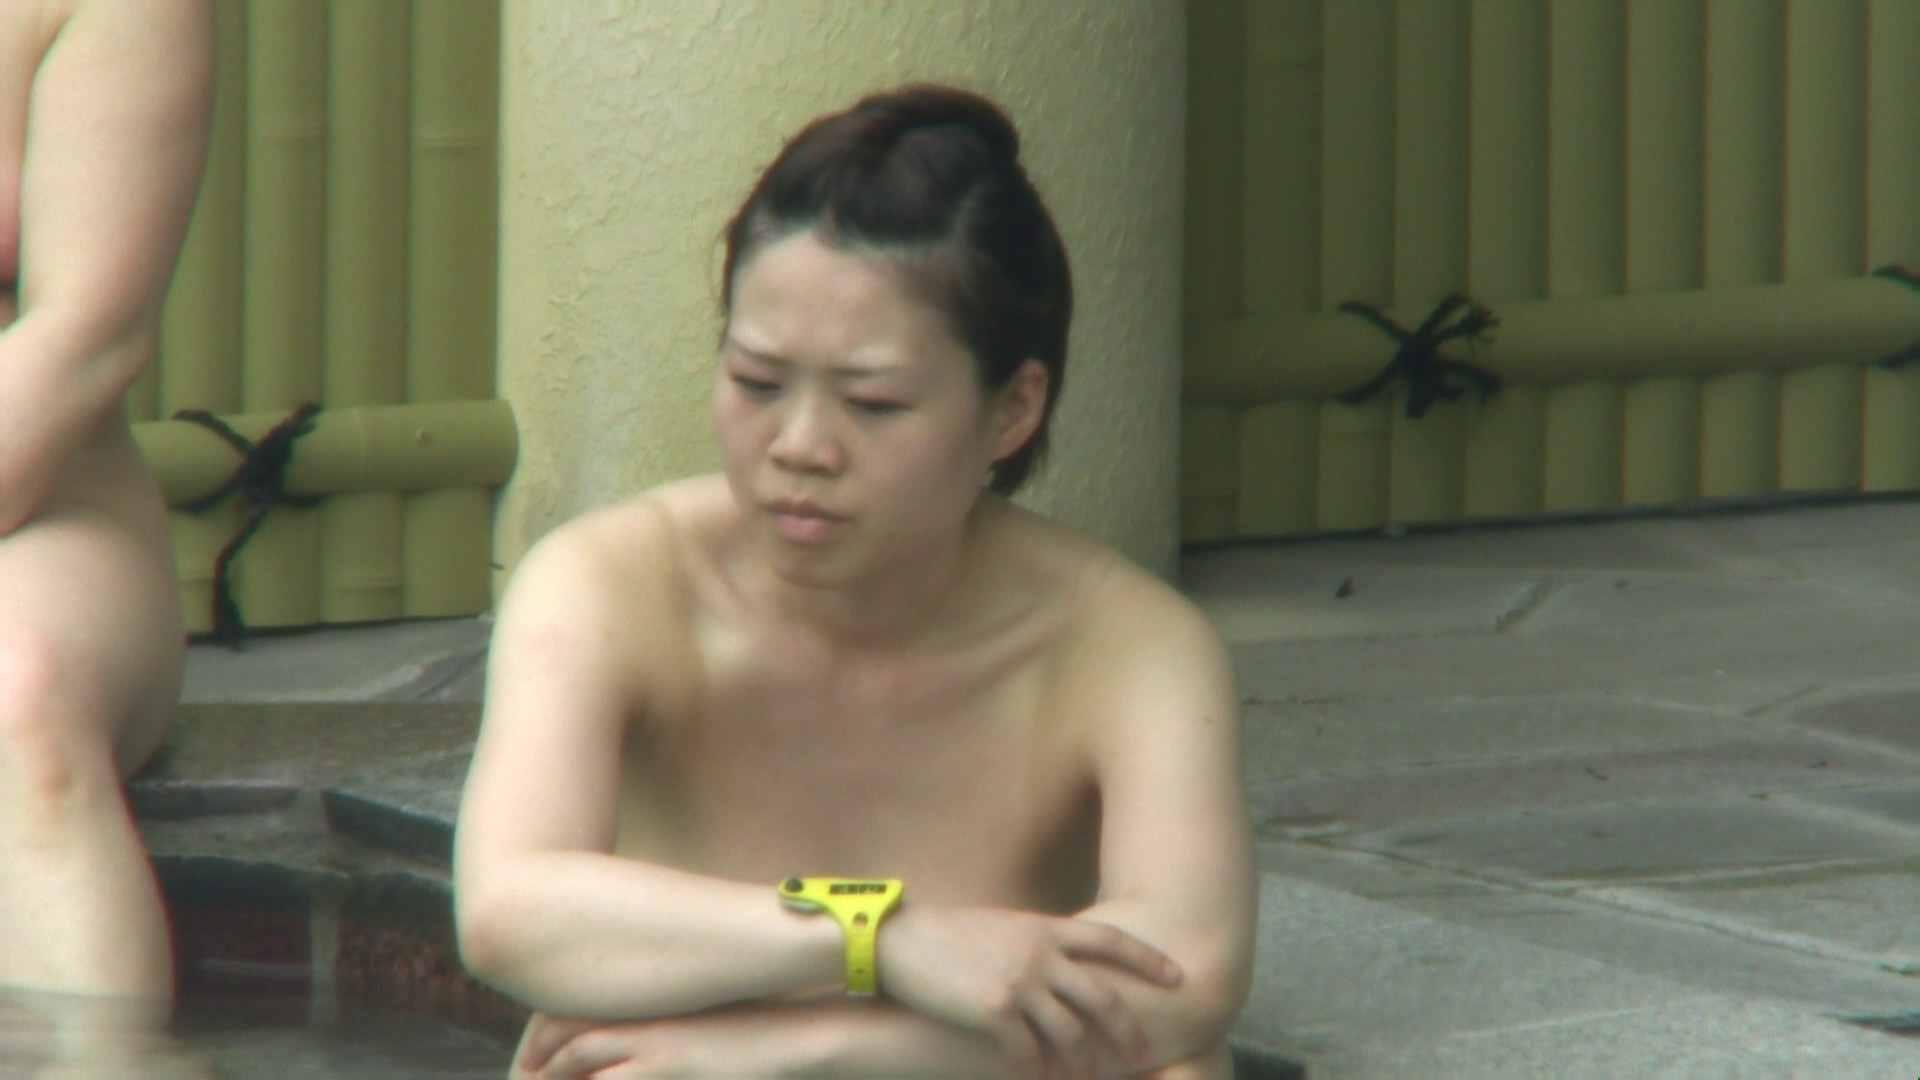 Aquaな露天風呂Vol.63【VIP限定】 露天 おめこ無修正動画無料 100pic 39